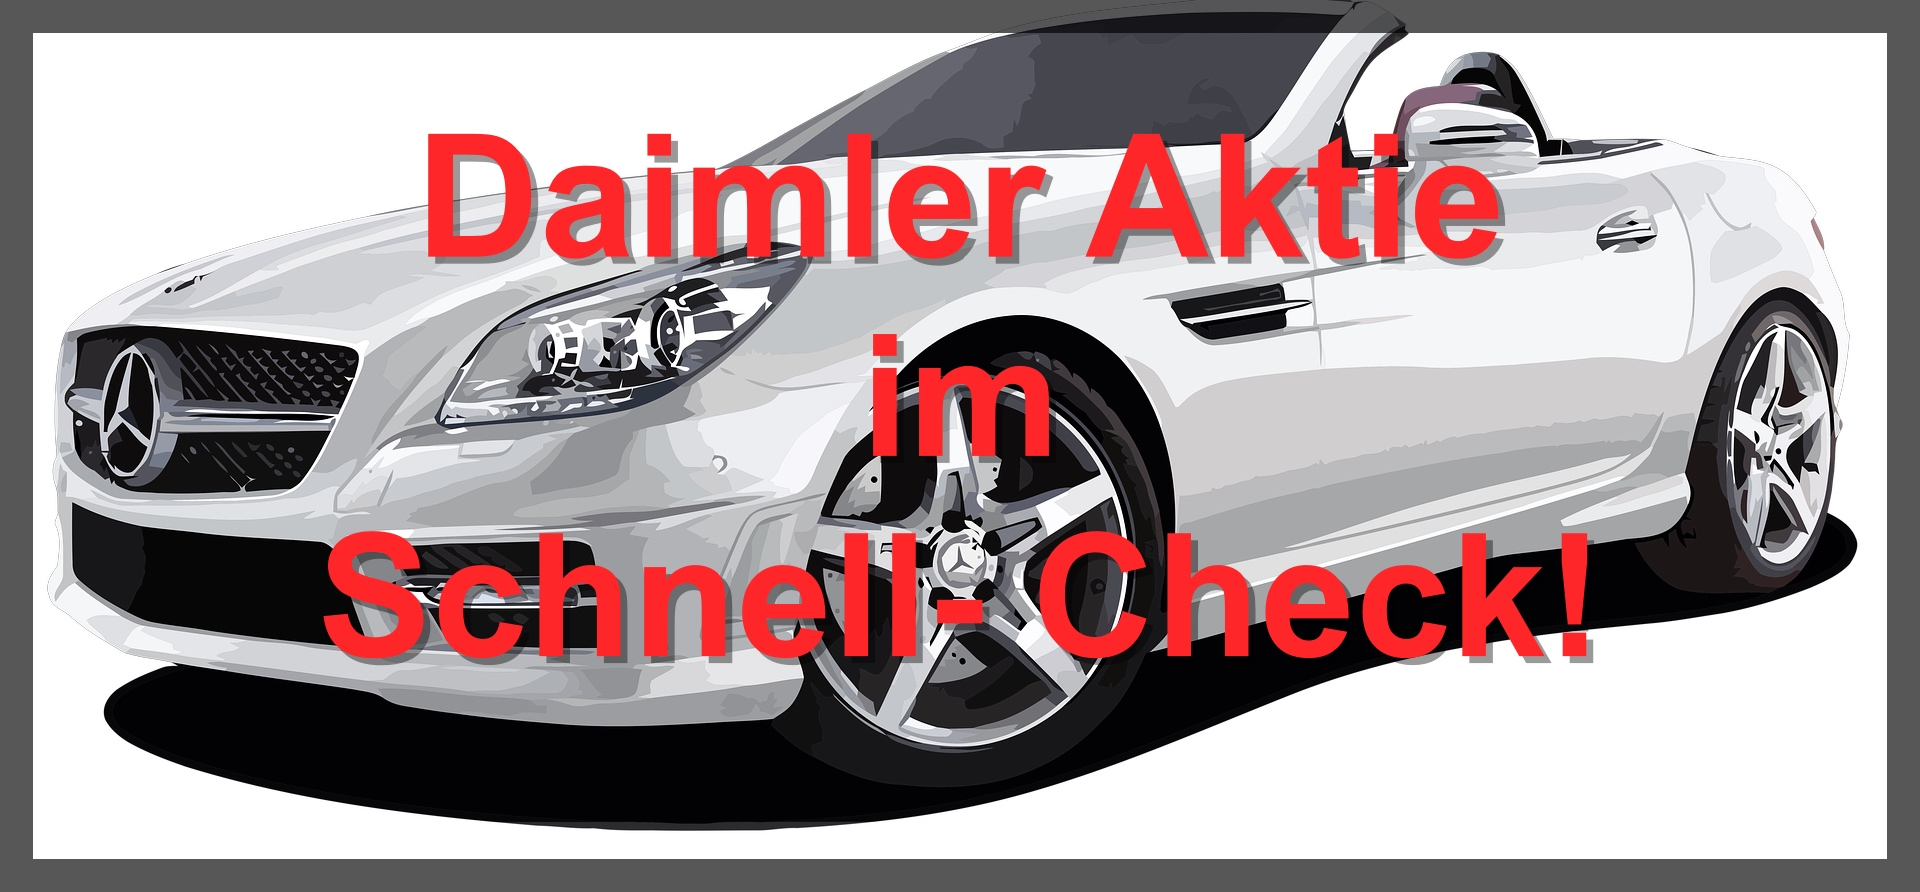 Daimler Aktie im Schnell Check: Cash Cow ohne Potenzial?